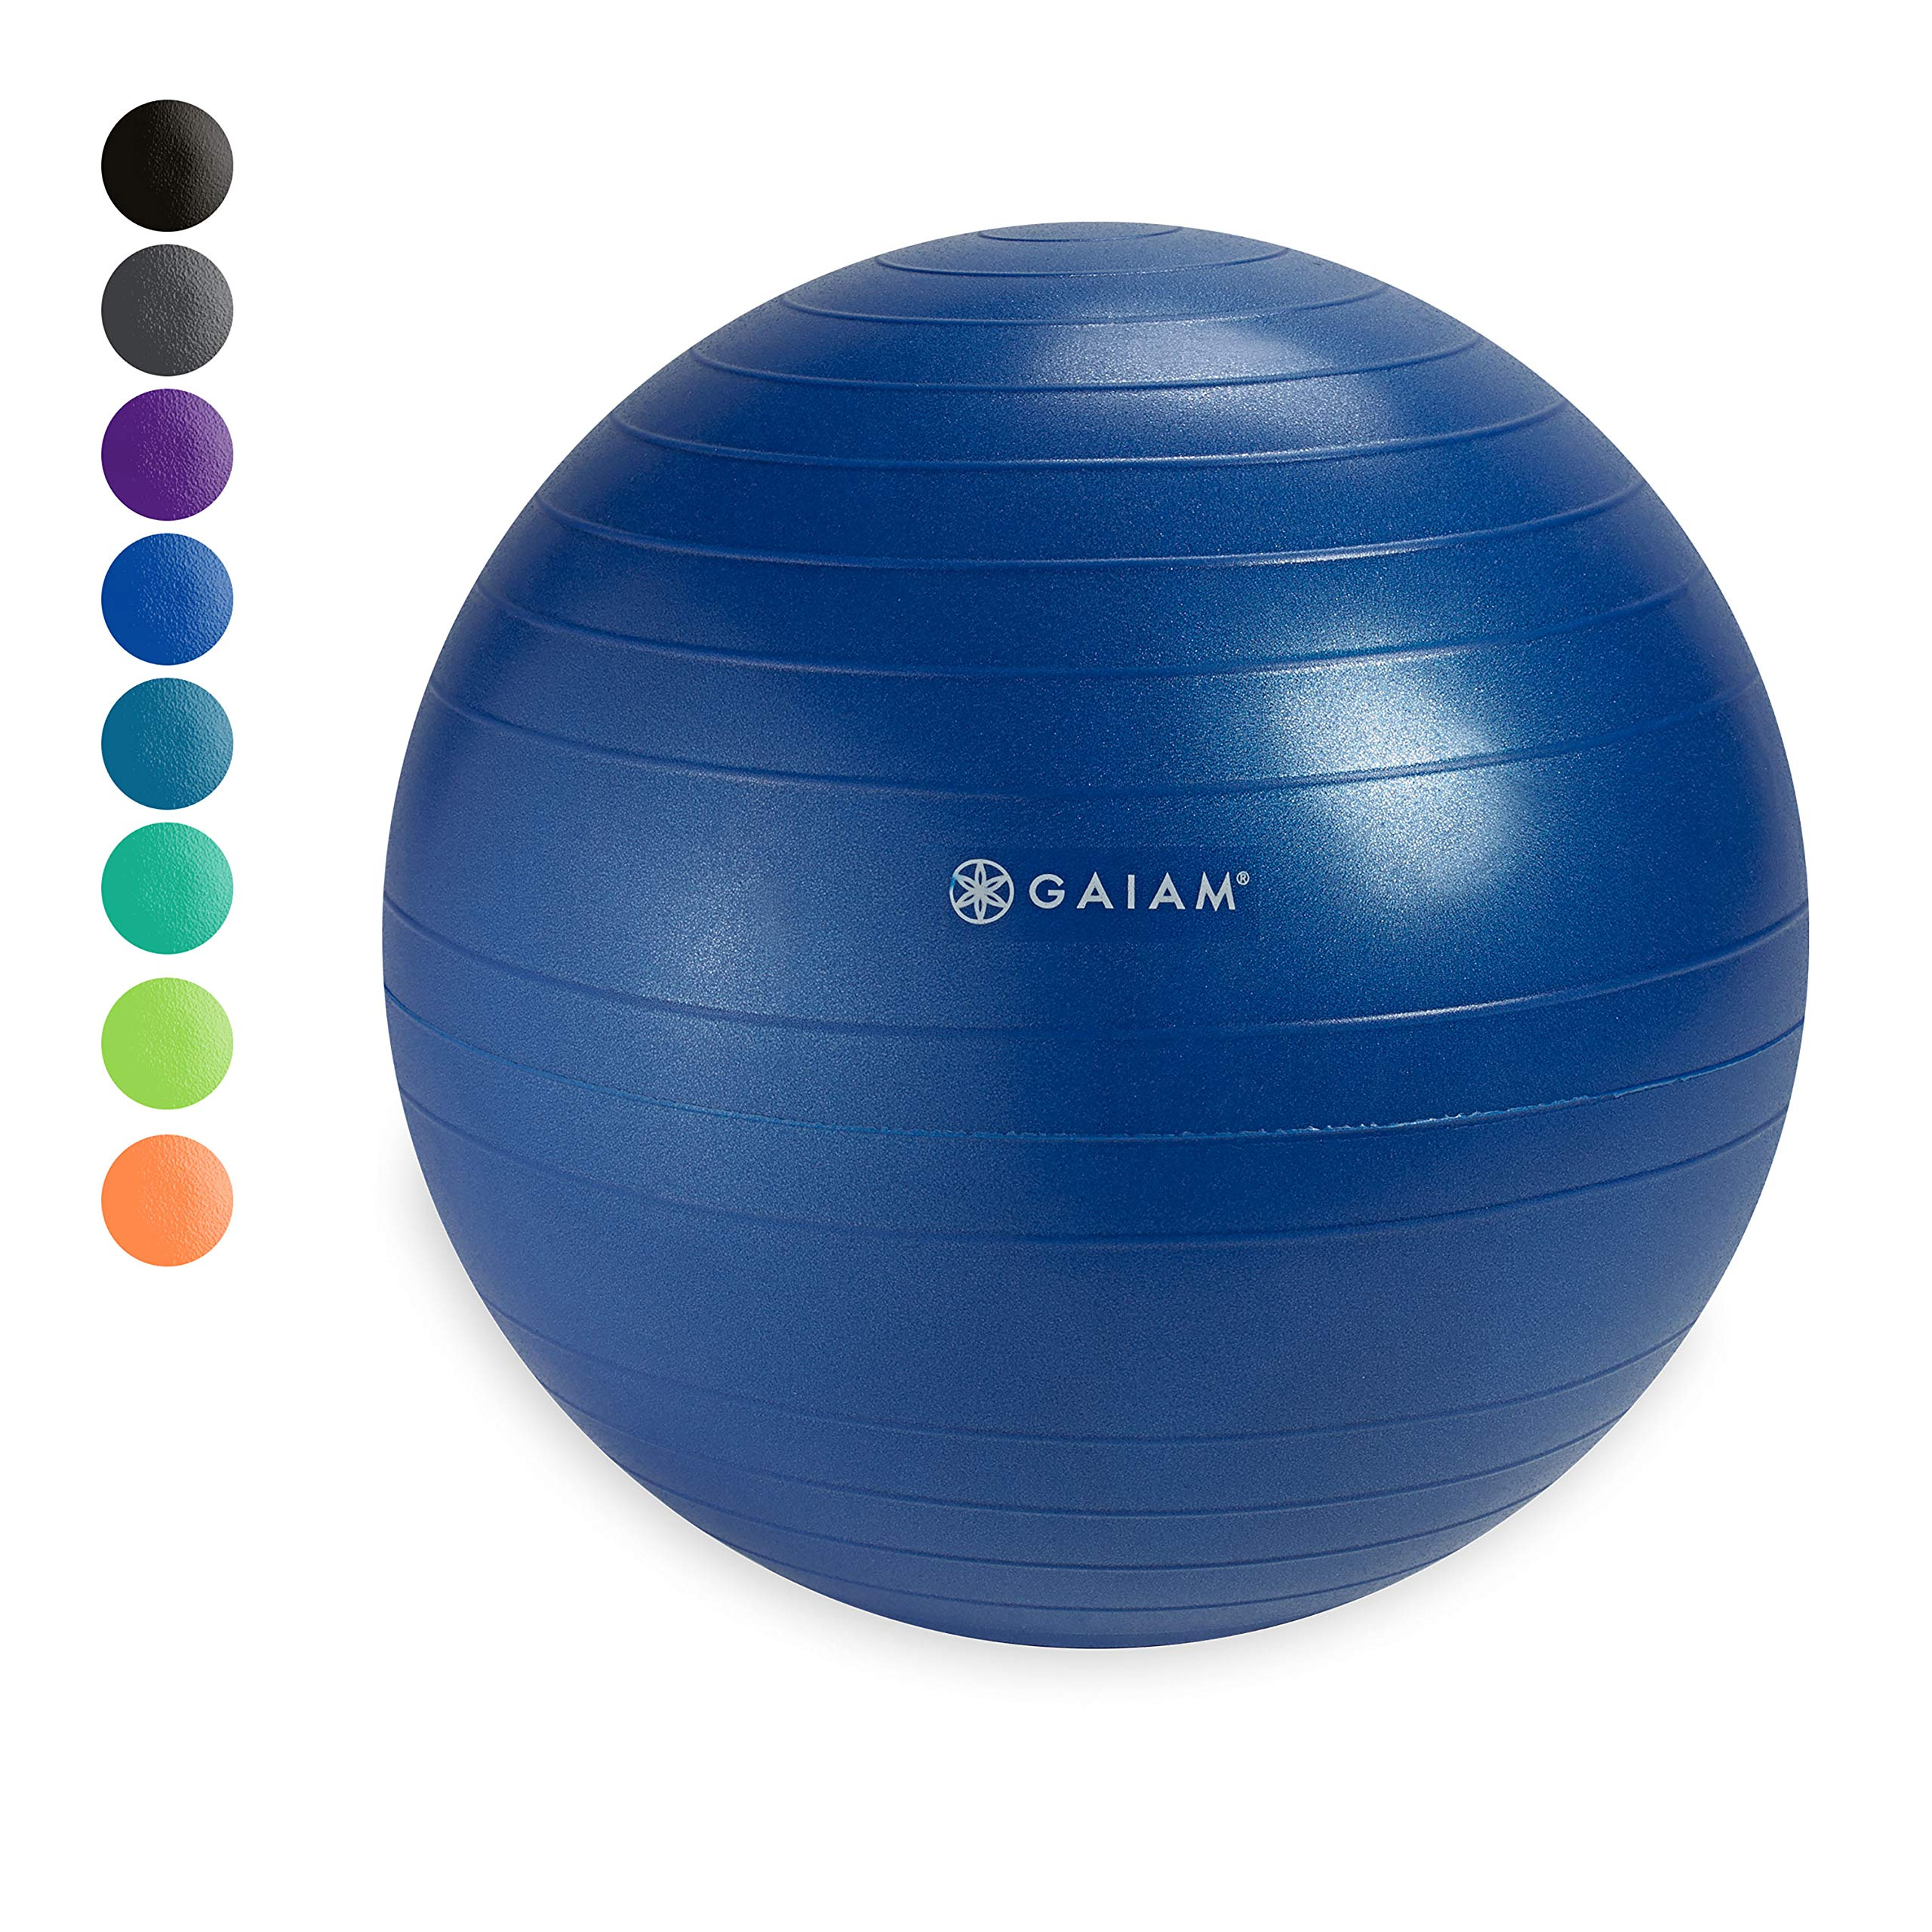 Gaiam Classic Balance Ball Chair Ball - Extra 52cm Balance Ball for Classic Balance Ball Chairs, Blue